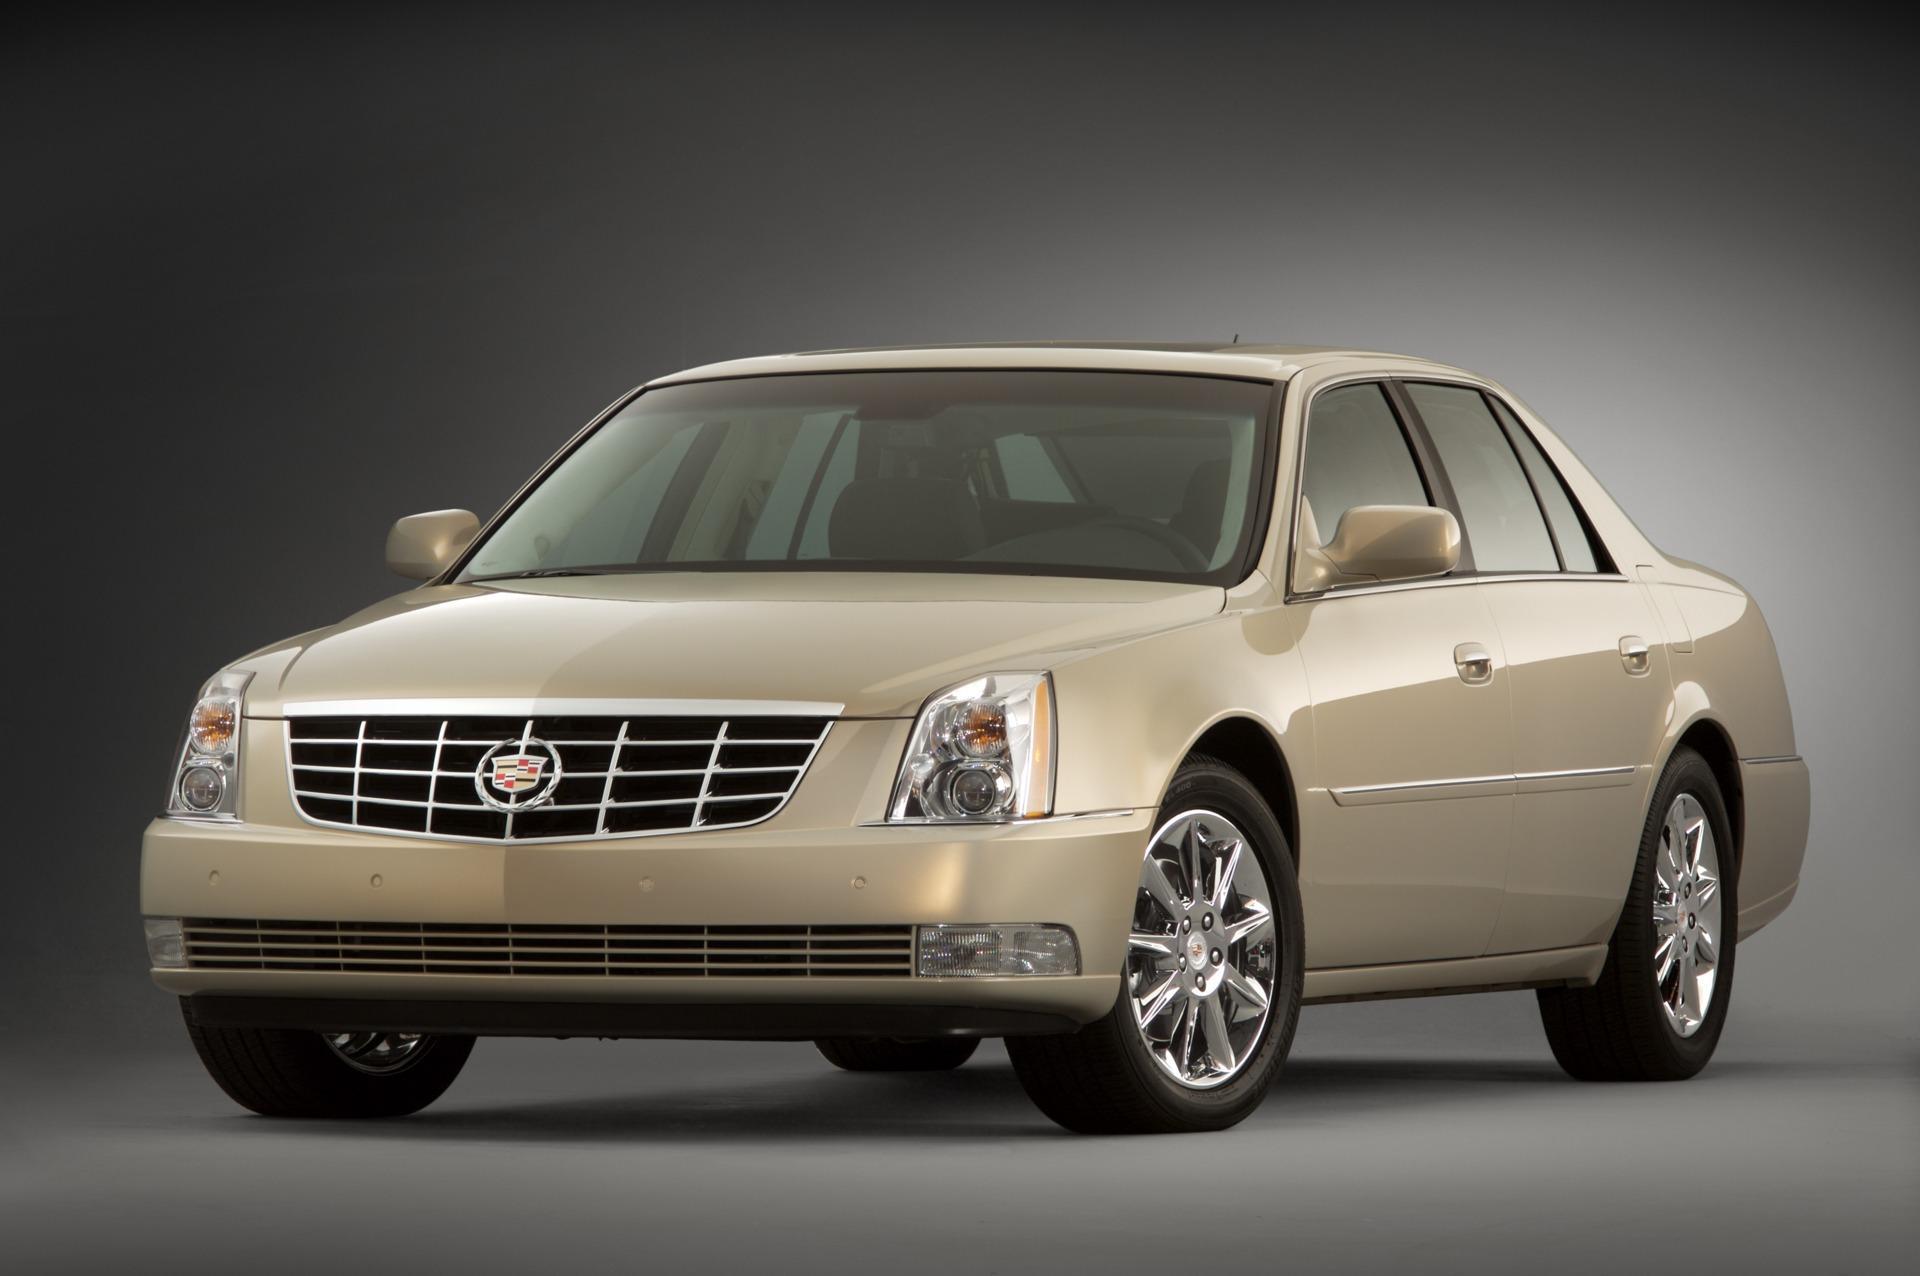 2009 Cadillac DTS News and Information   conceptcarz.com